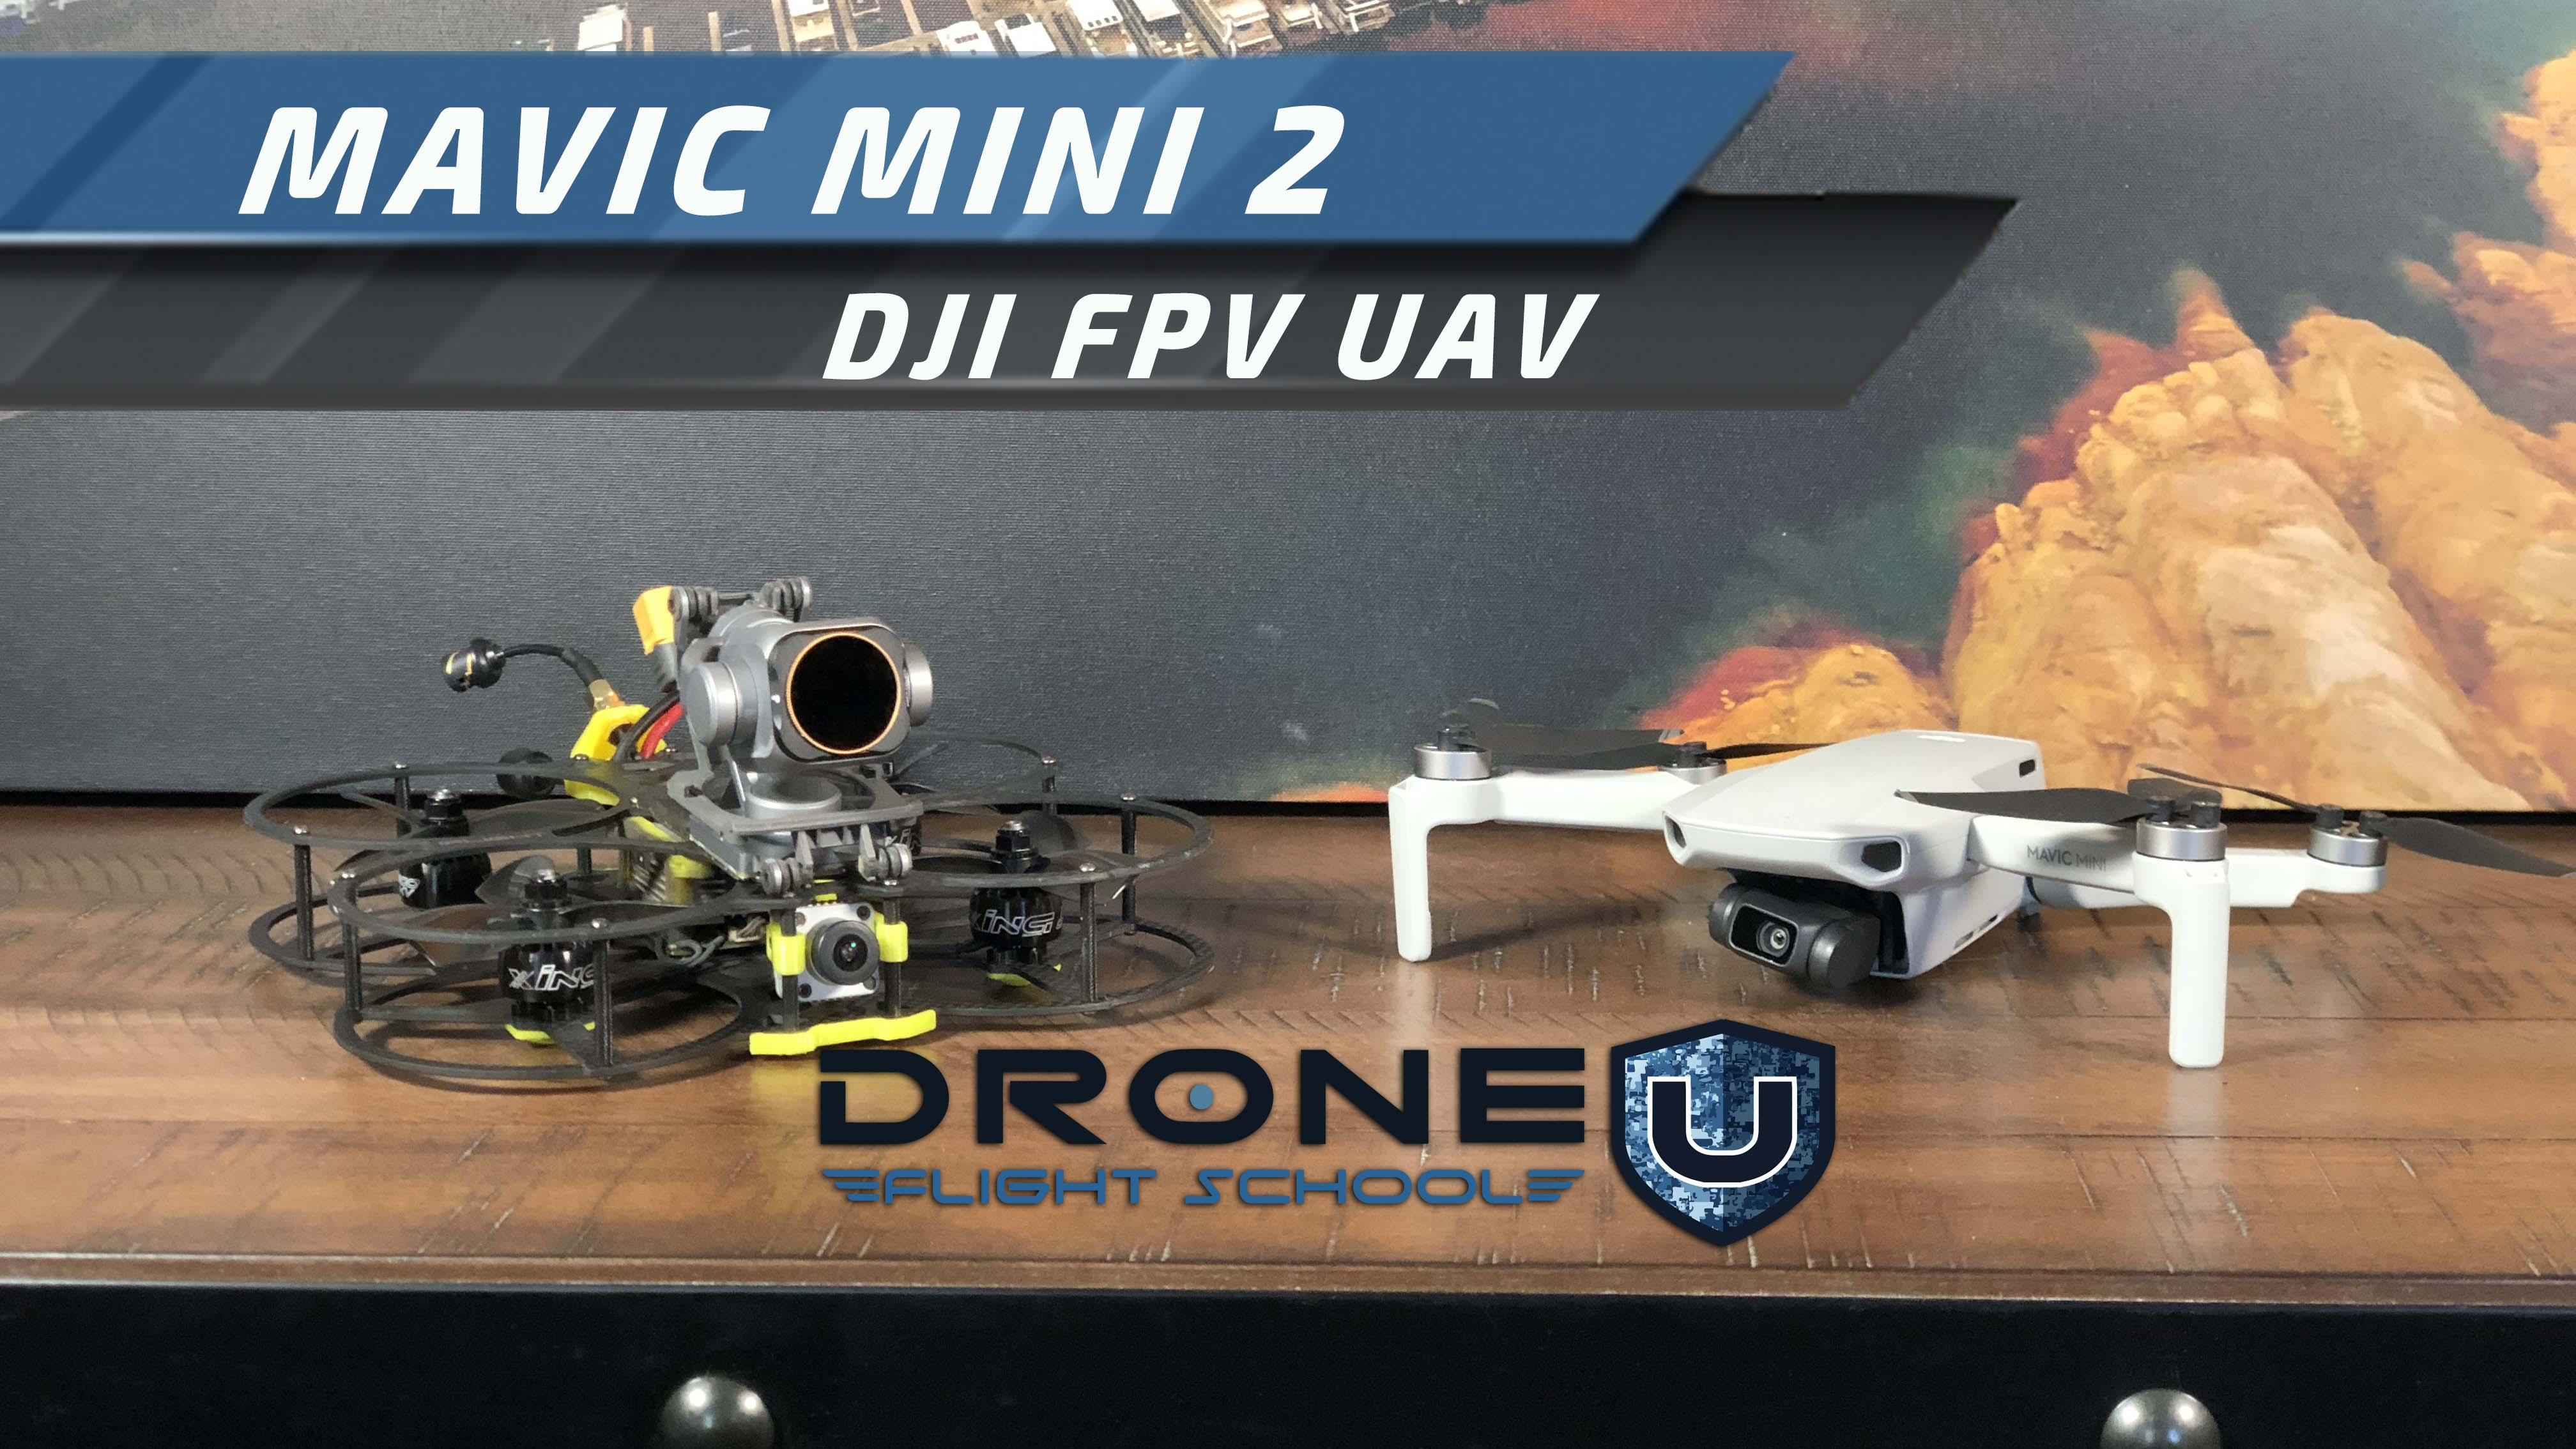 Dji To Launch Mavic Mini 2 Fpv Drone Drone U